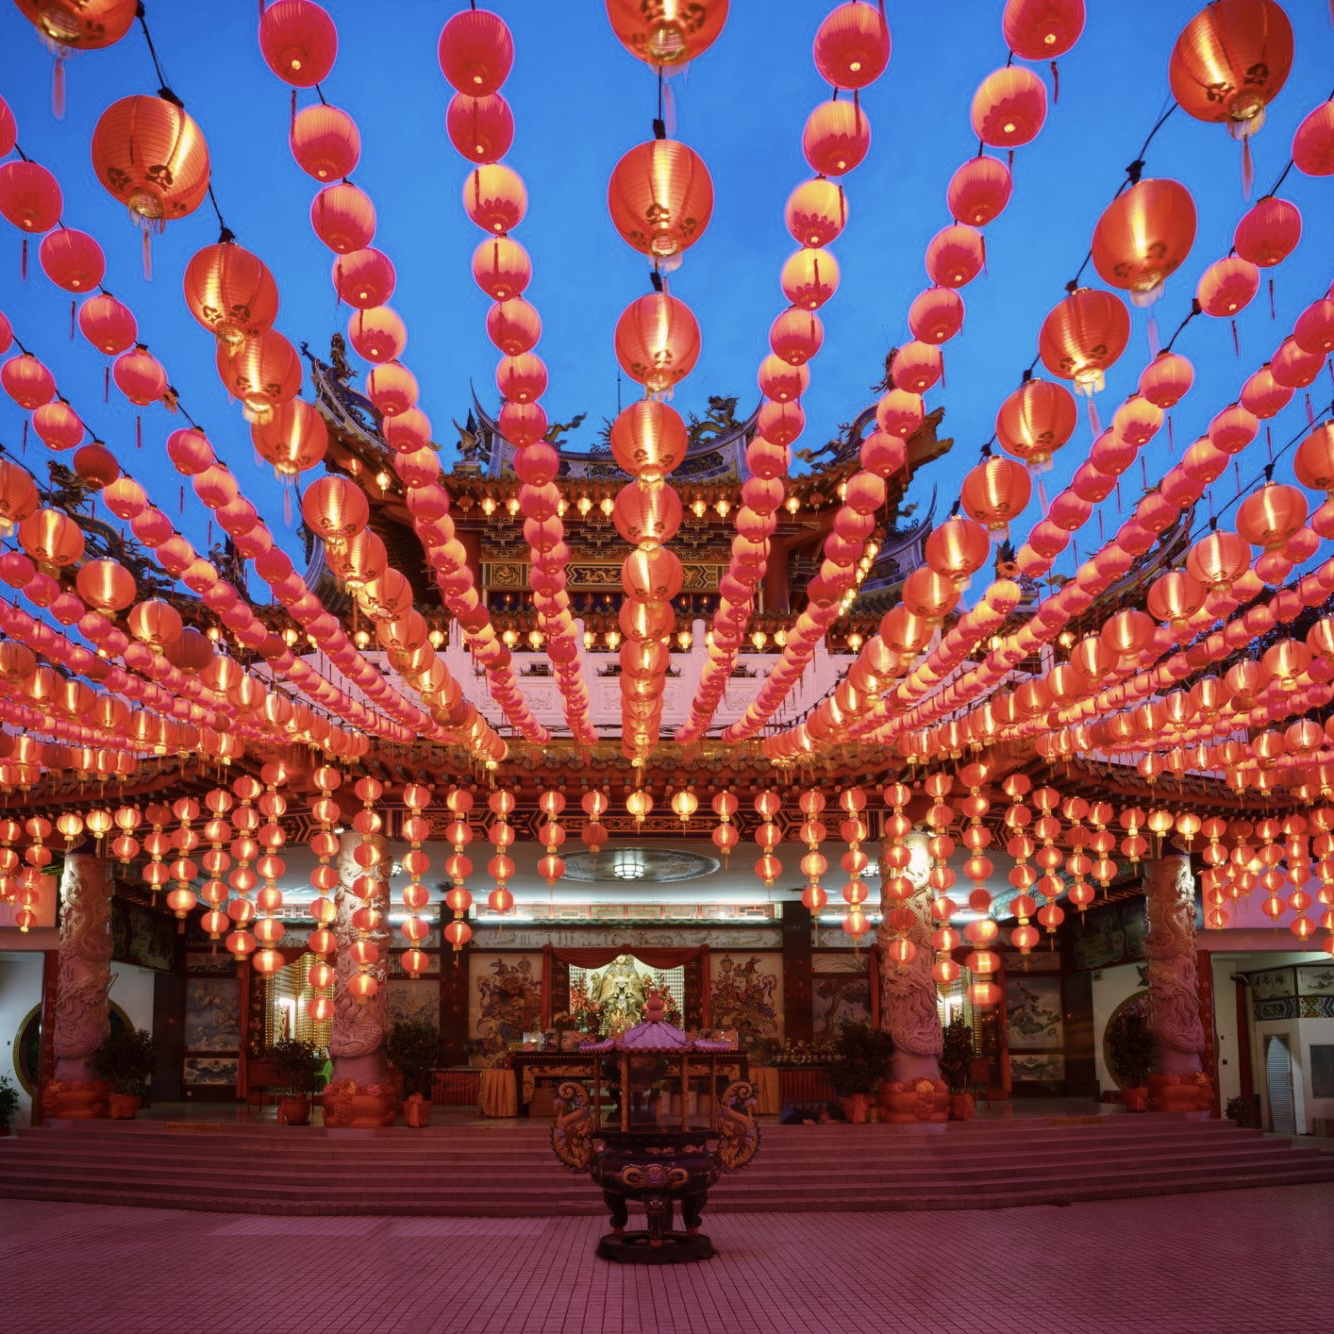 Lunar new year lanterns strung on a building